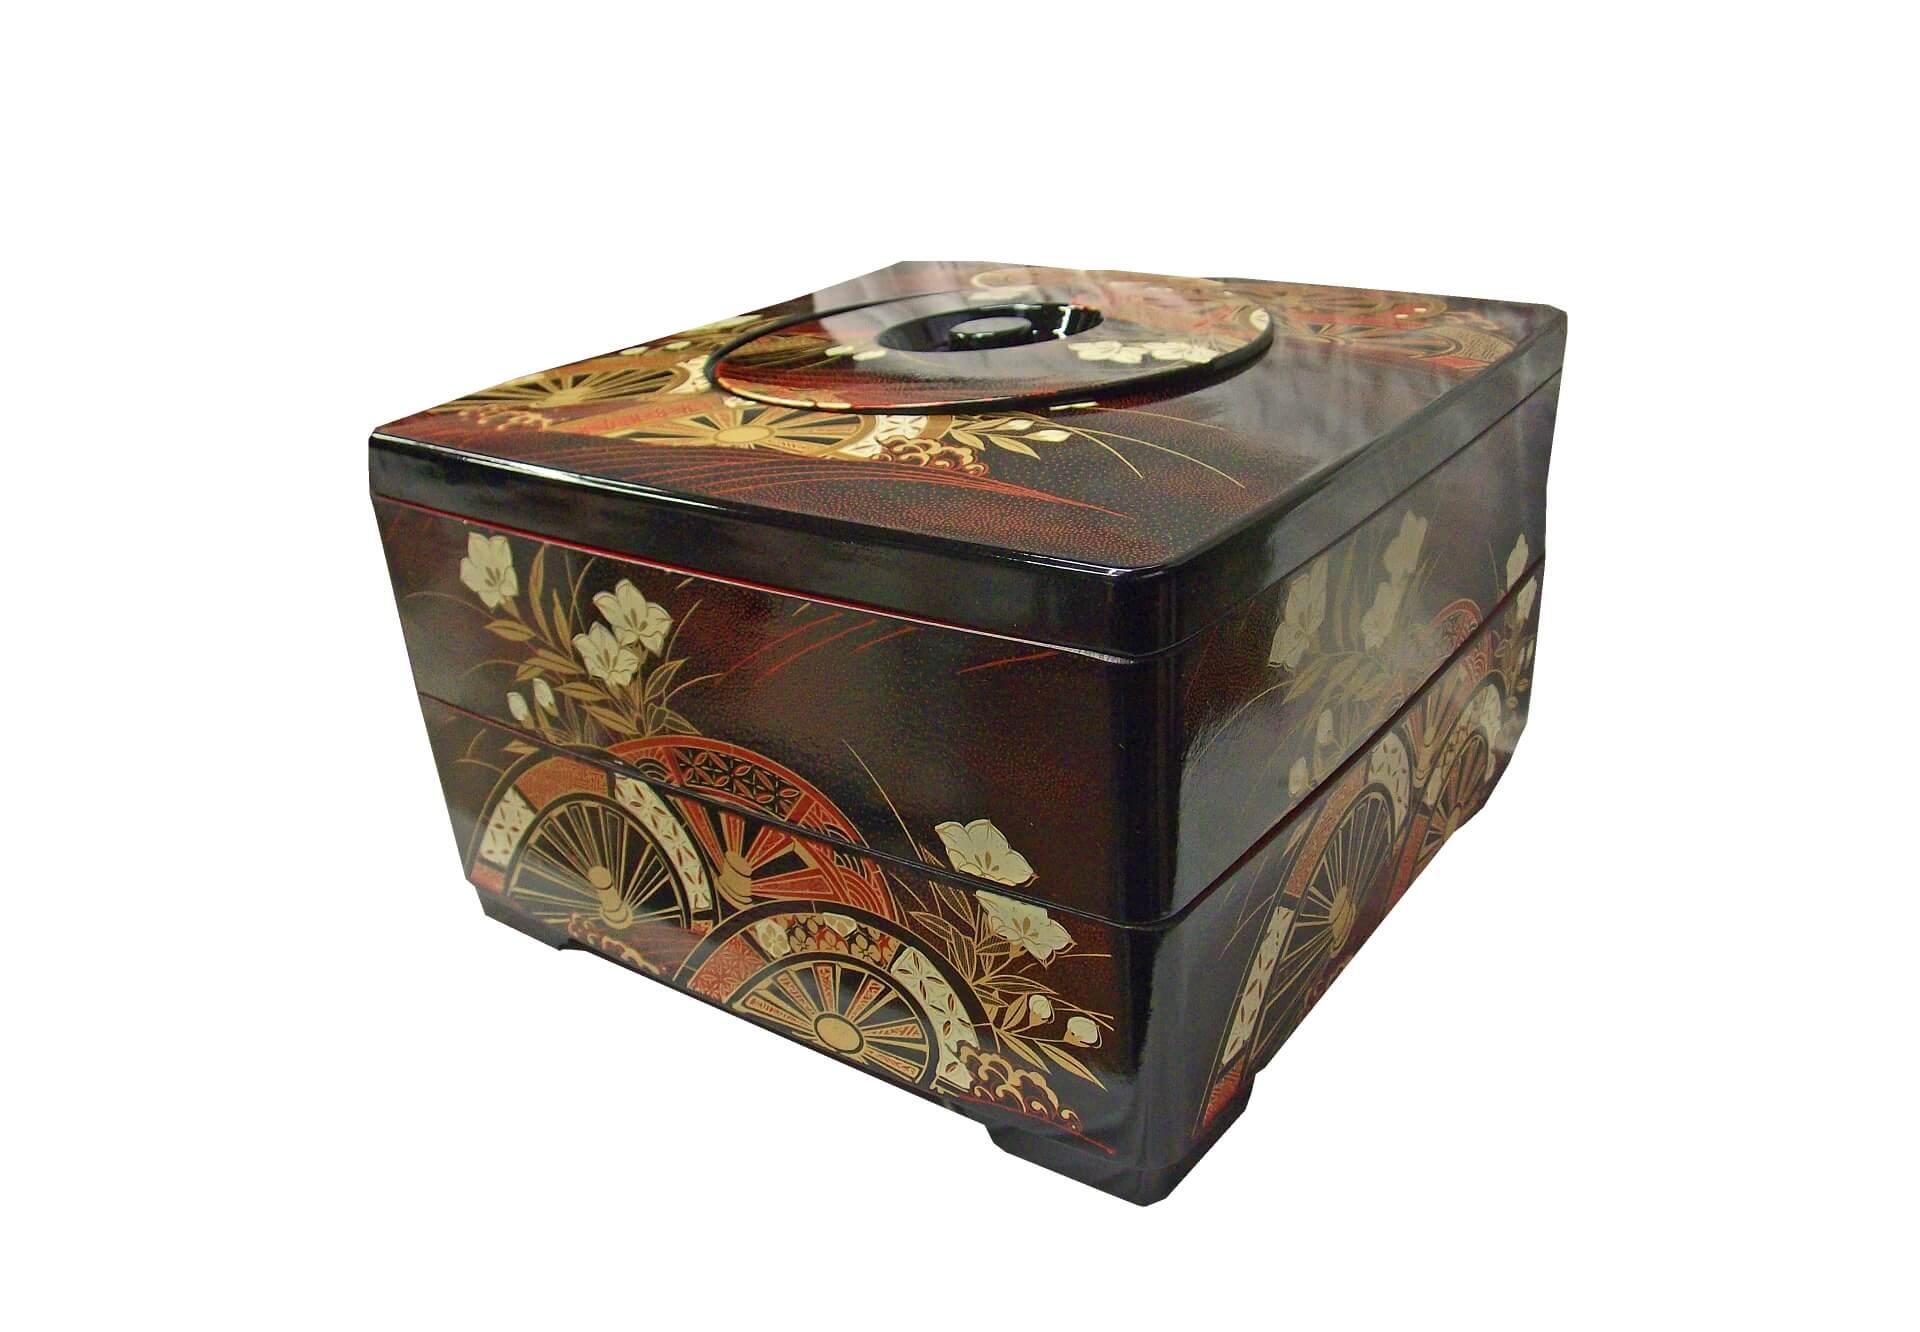 shikki-lacquerware-art